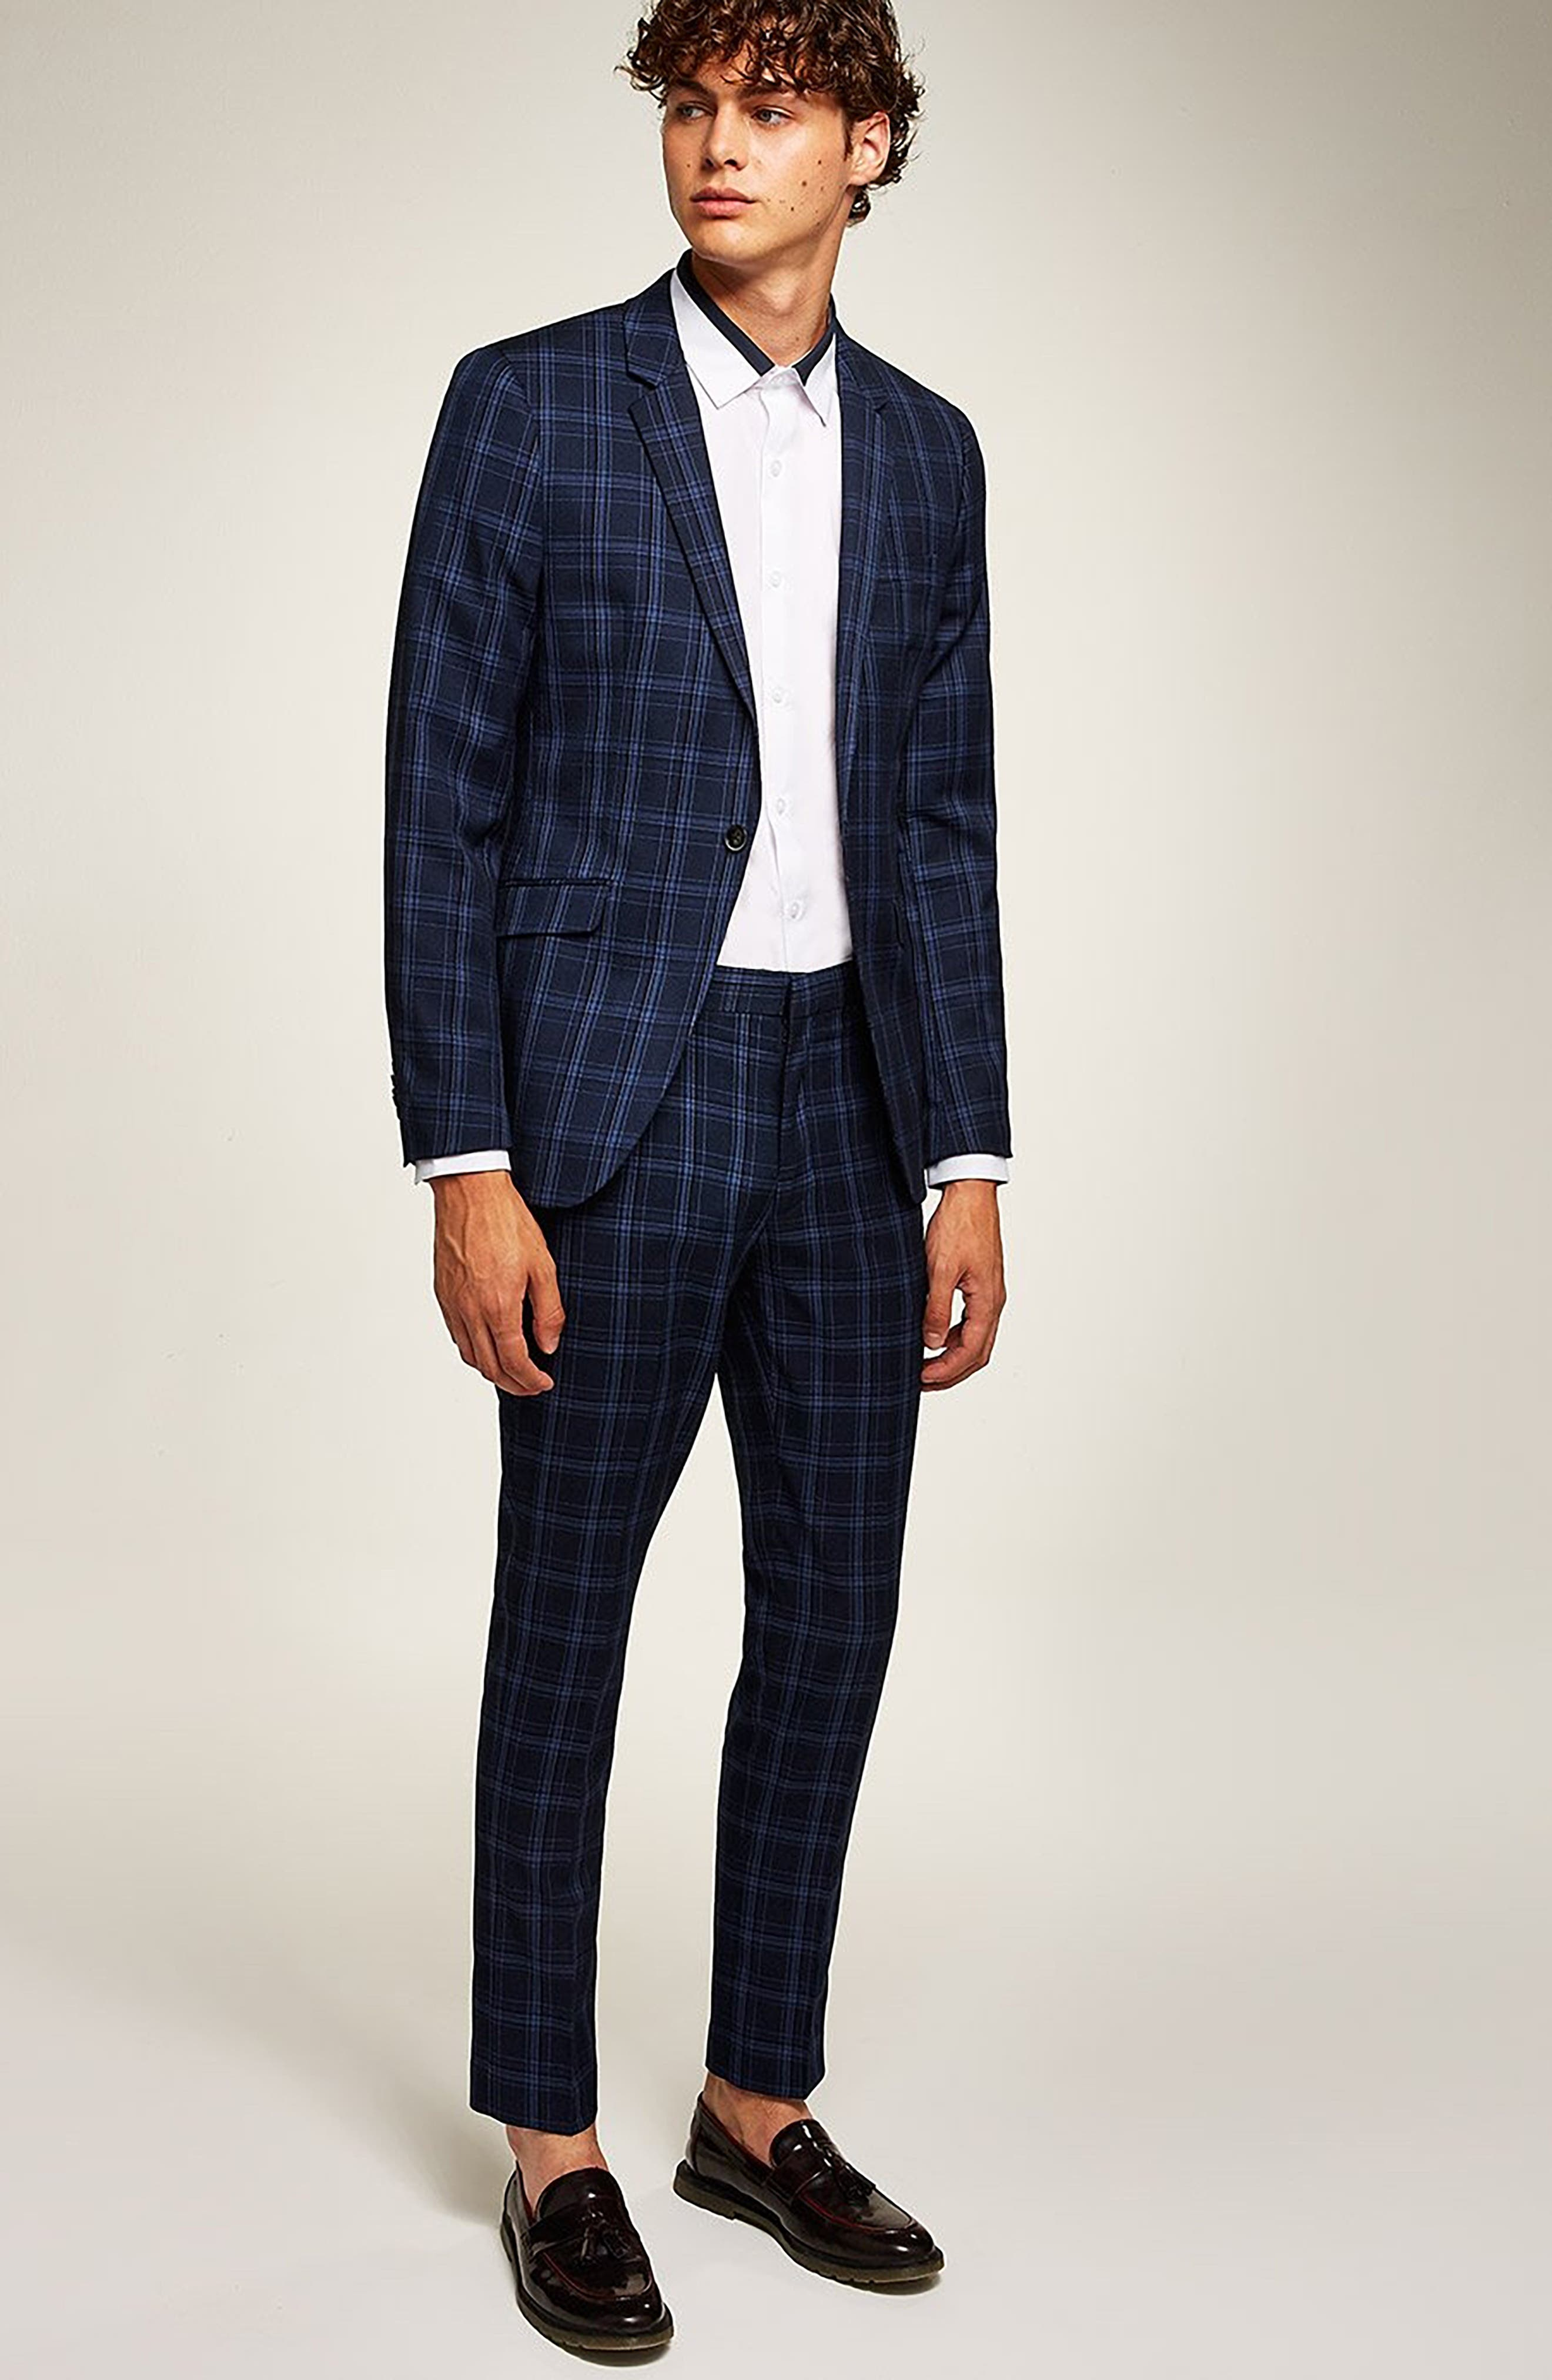 TOPMAN, Skinny Fit Check Suit Jacket, Alternate thumbnail 5, color, 400